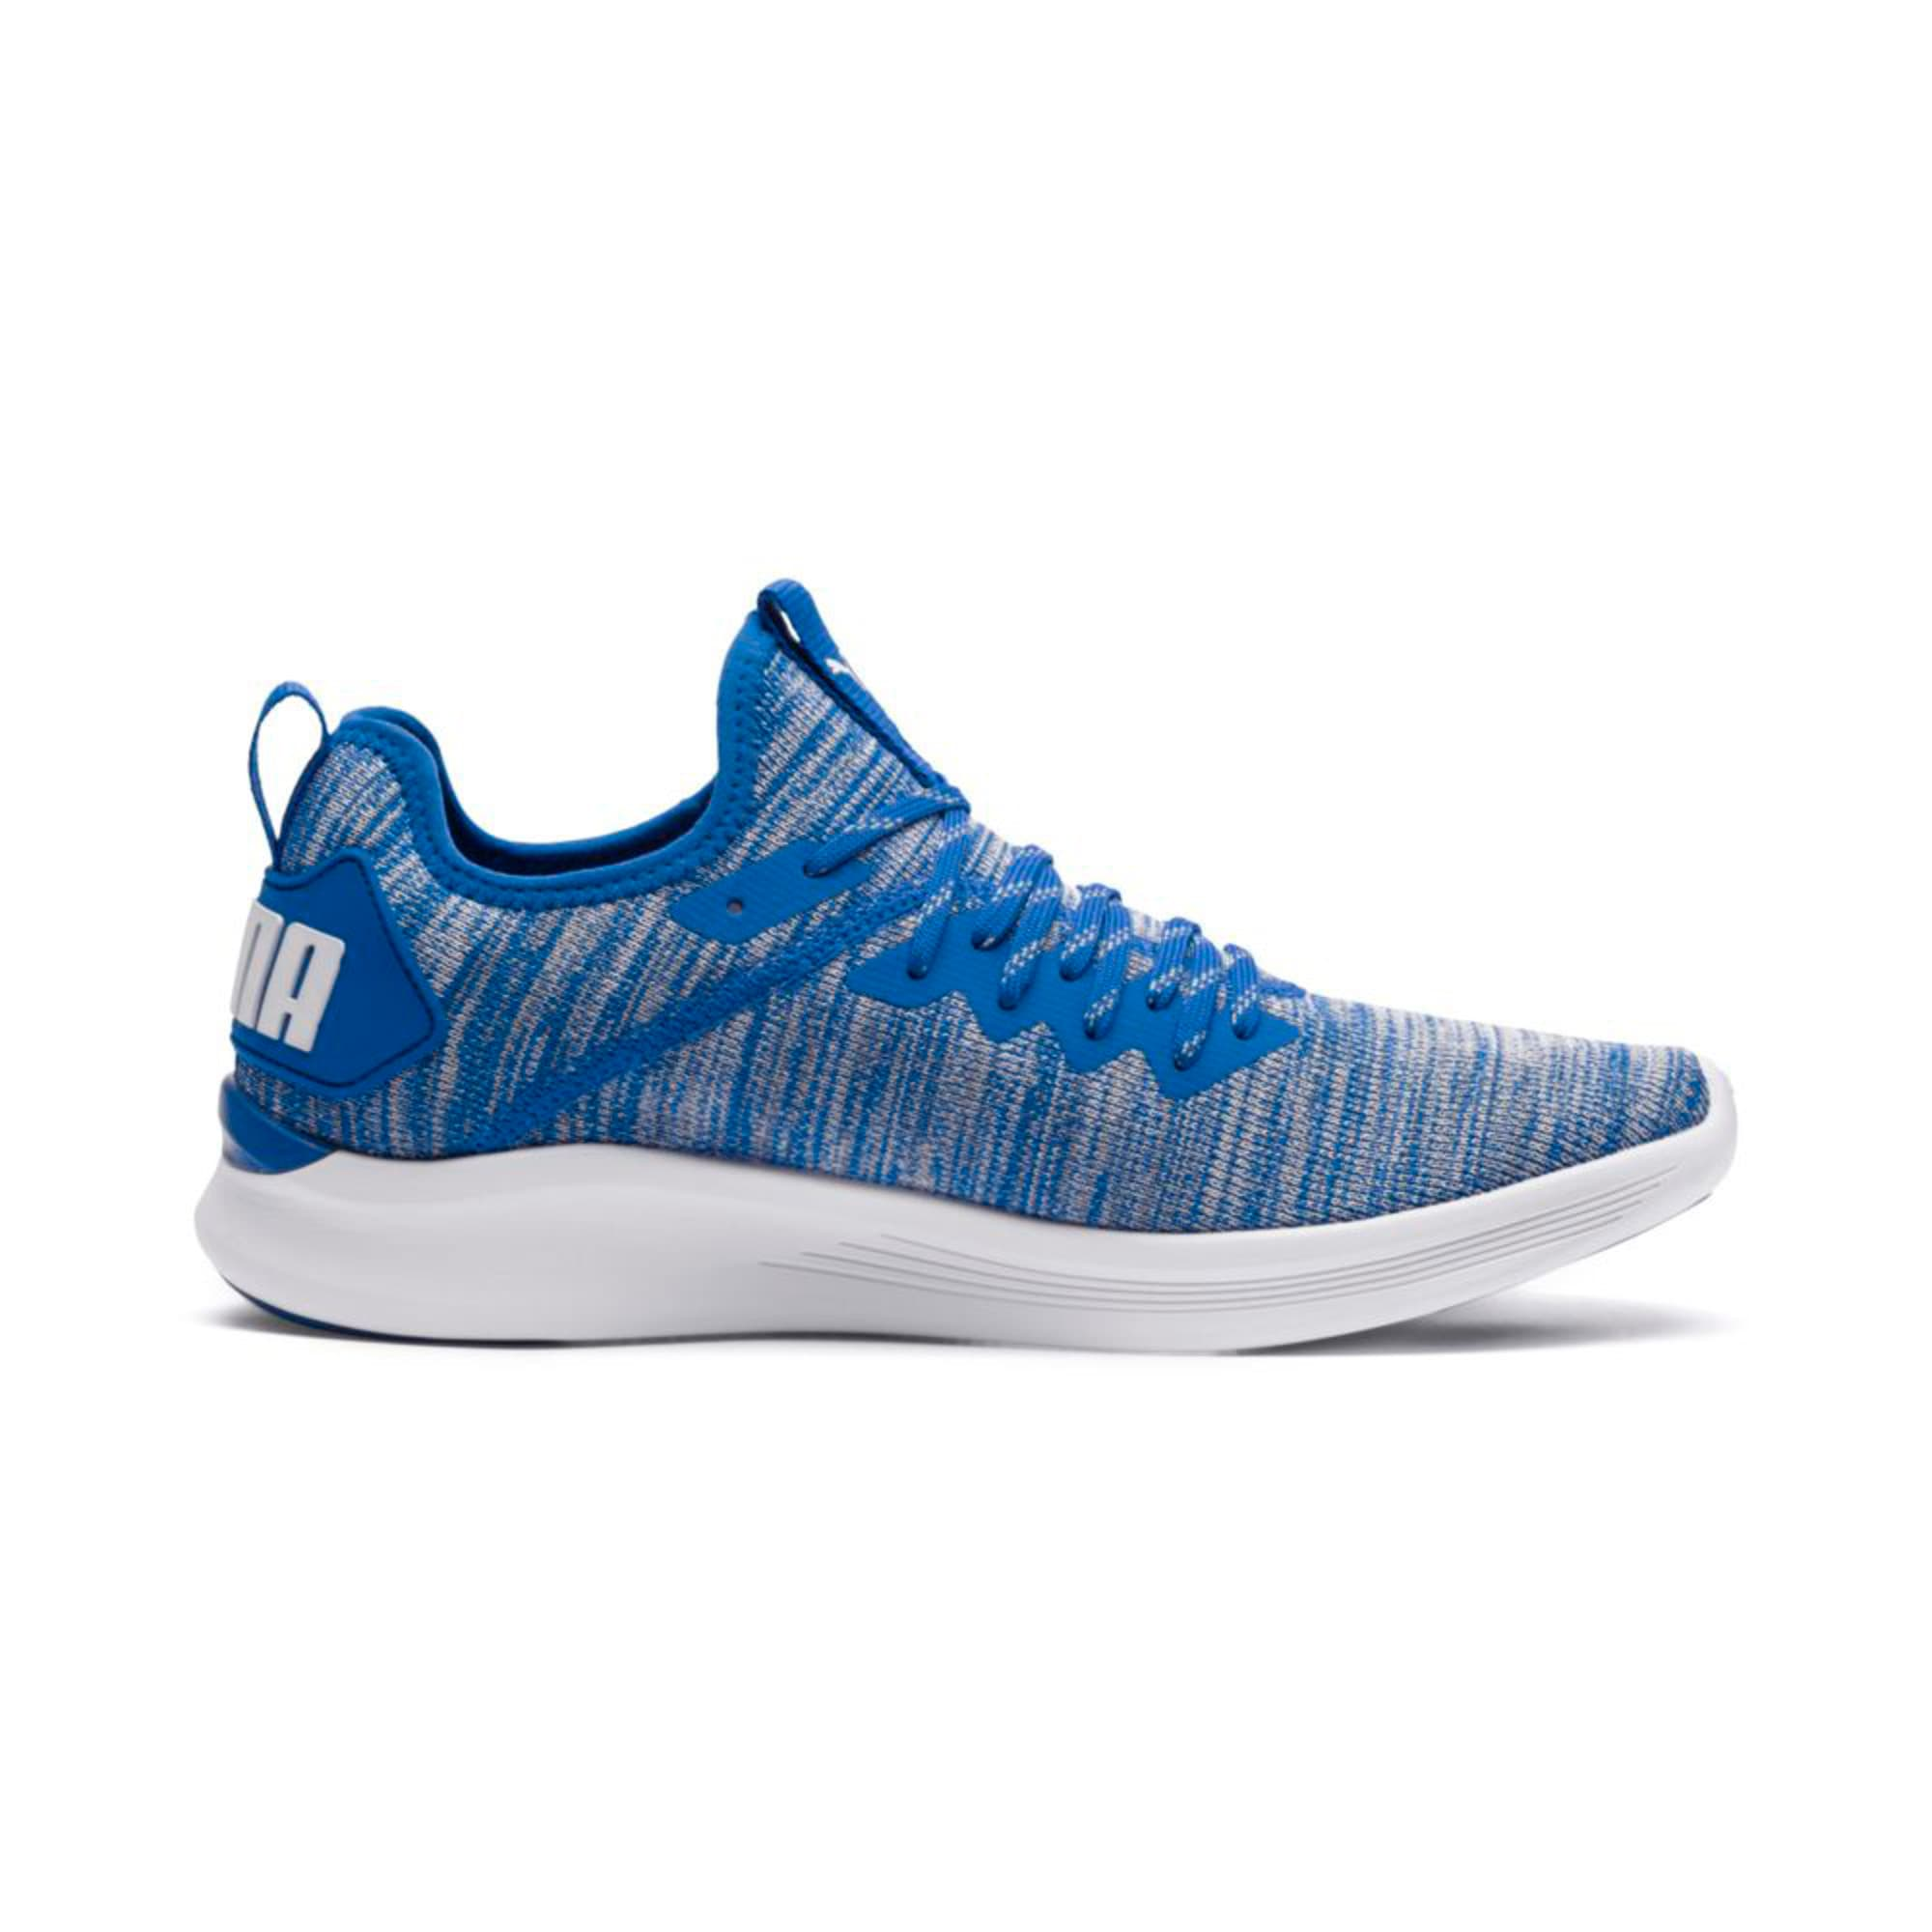 Thumbnail 5 of IGNITE Flash evoKNIT Men's Training Shoes, Strong Blue-White, medium-IND